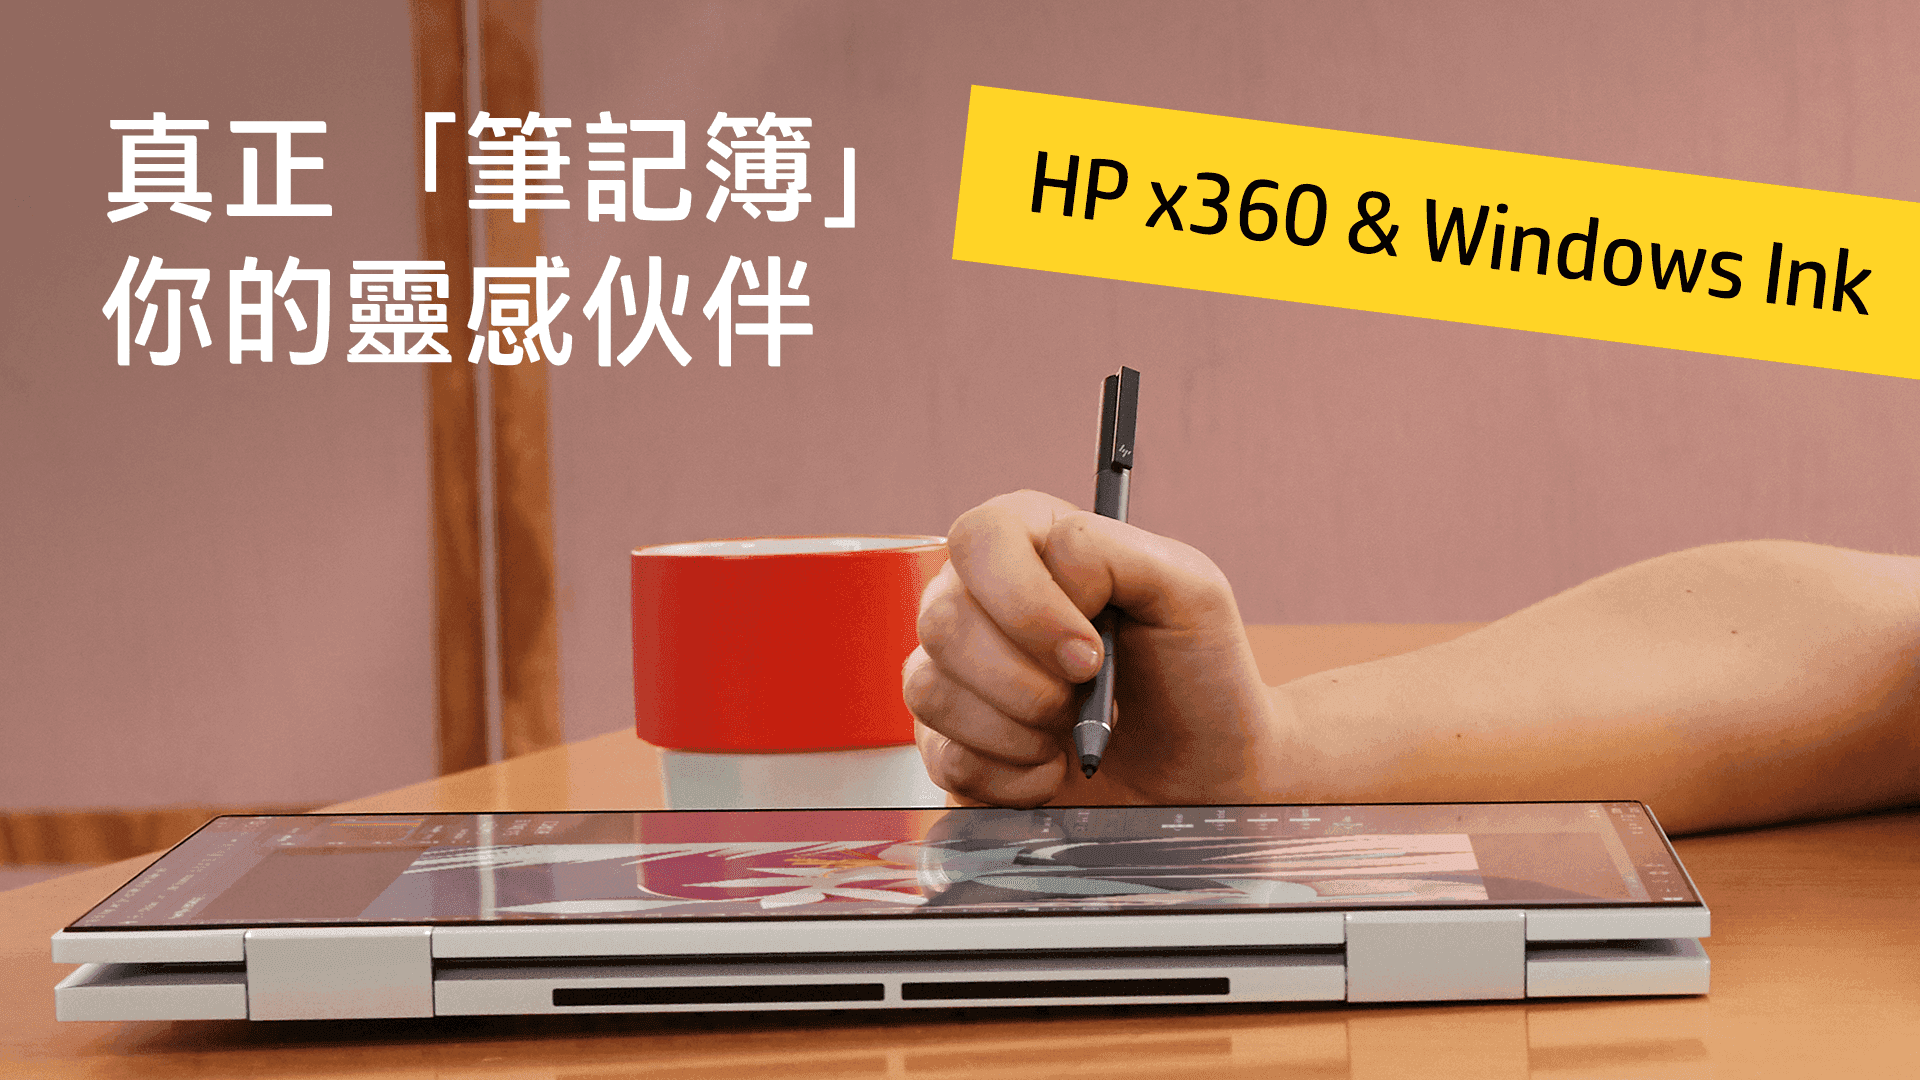 Windows Ink & HP x360系列 – 你的靈感伙伴